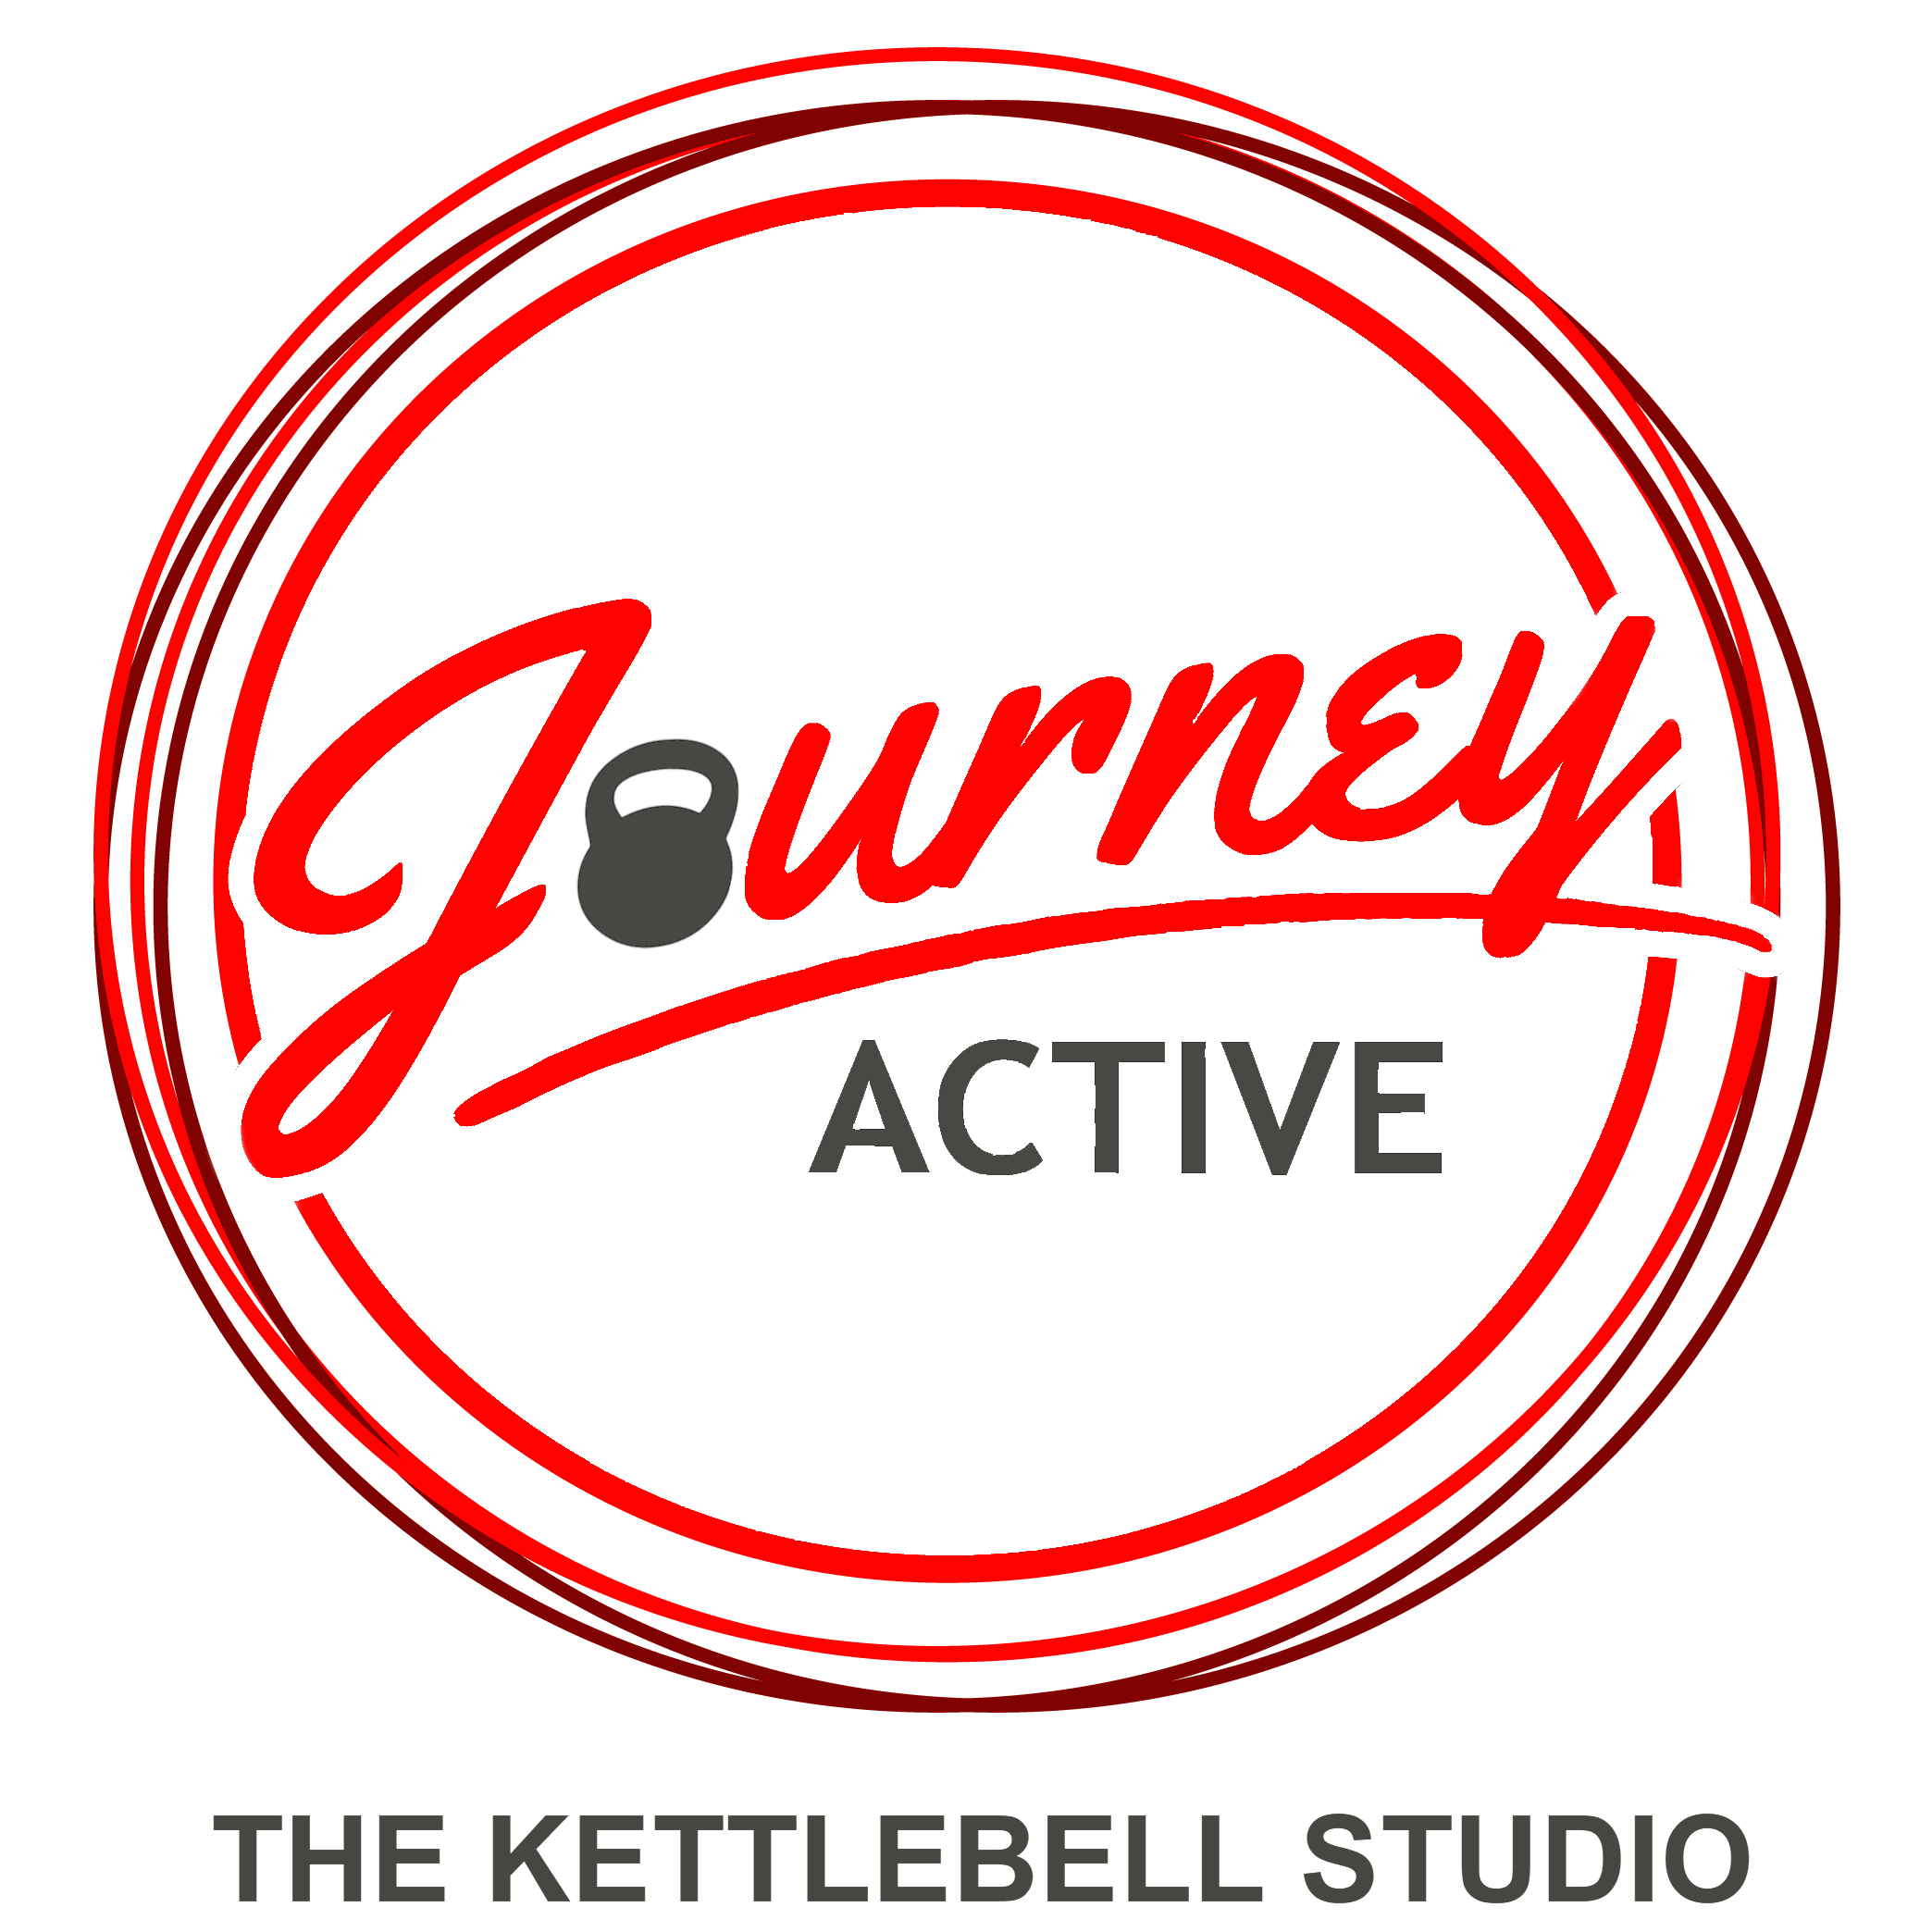 Journey Active, Kettlebells, Fitness, Nutrition